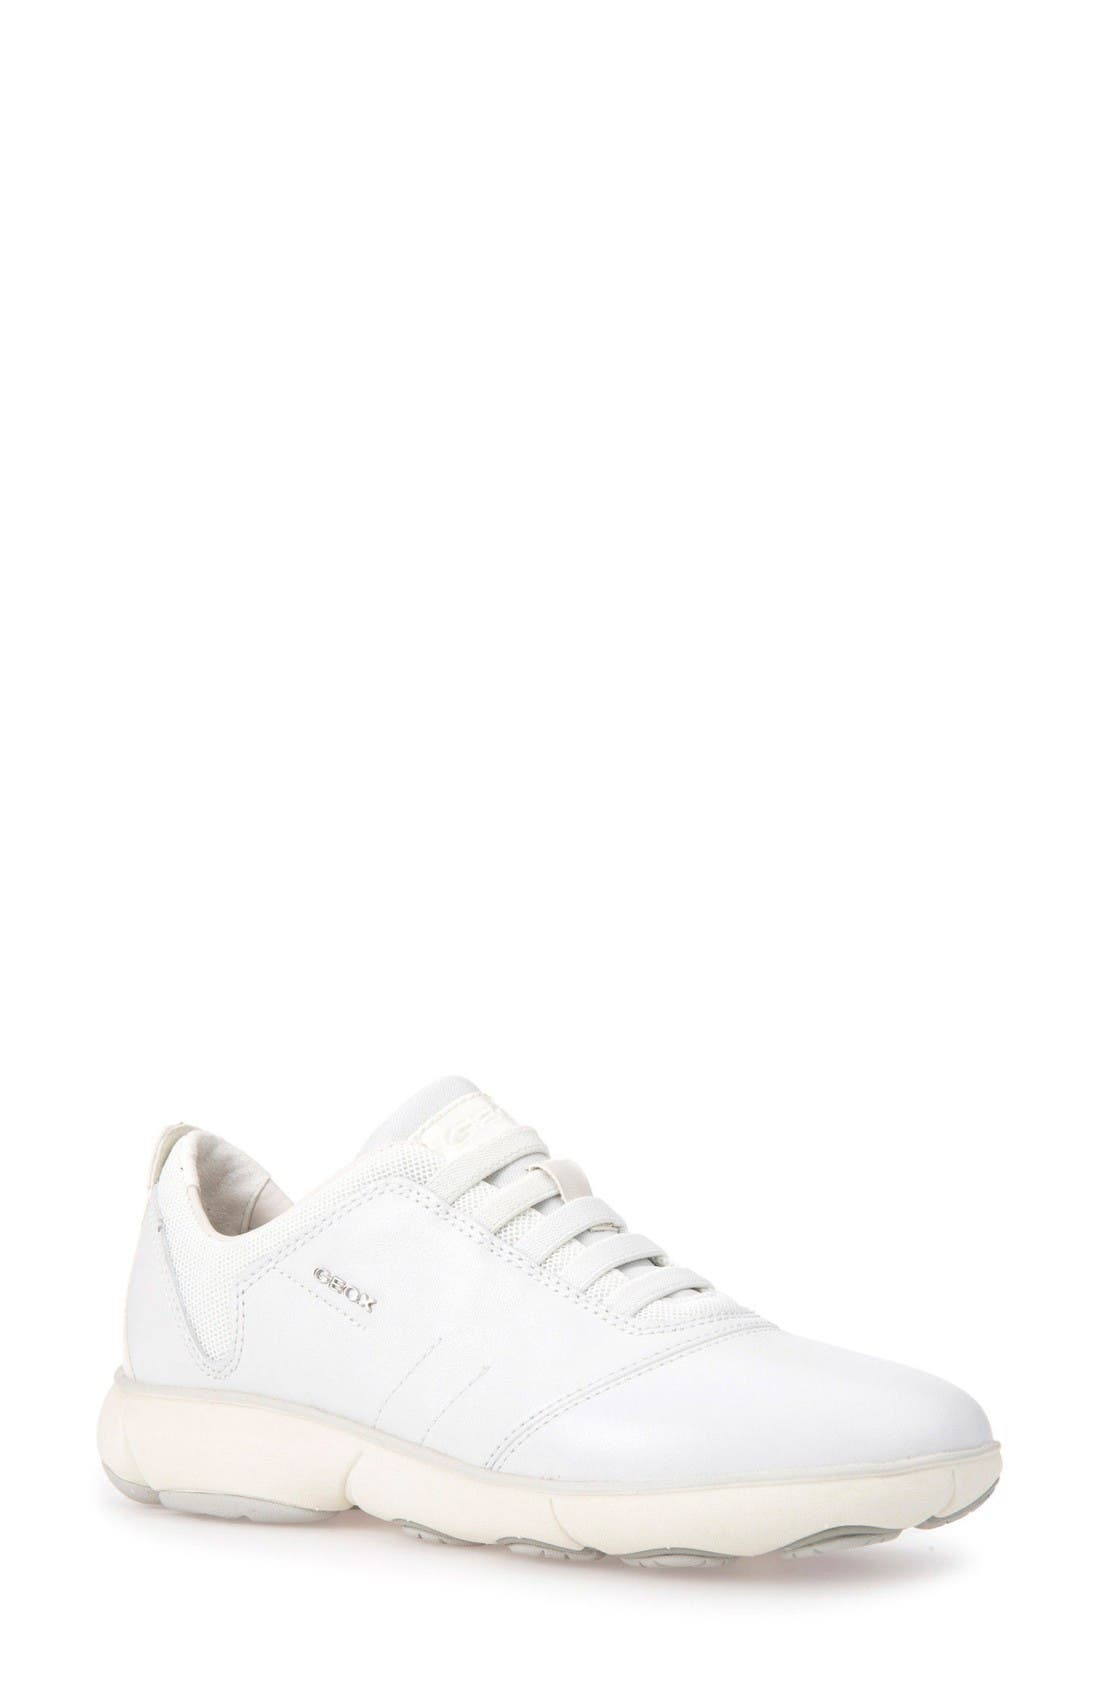 Nebula Slip-On Sneaker,                         Main,                         color, White Leather